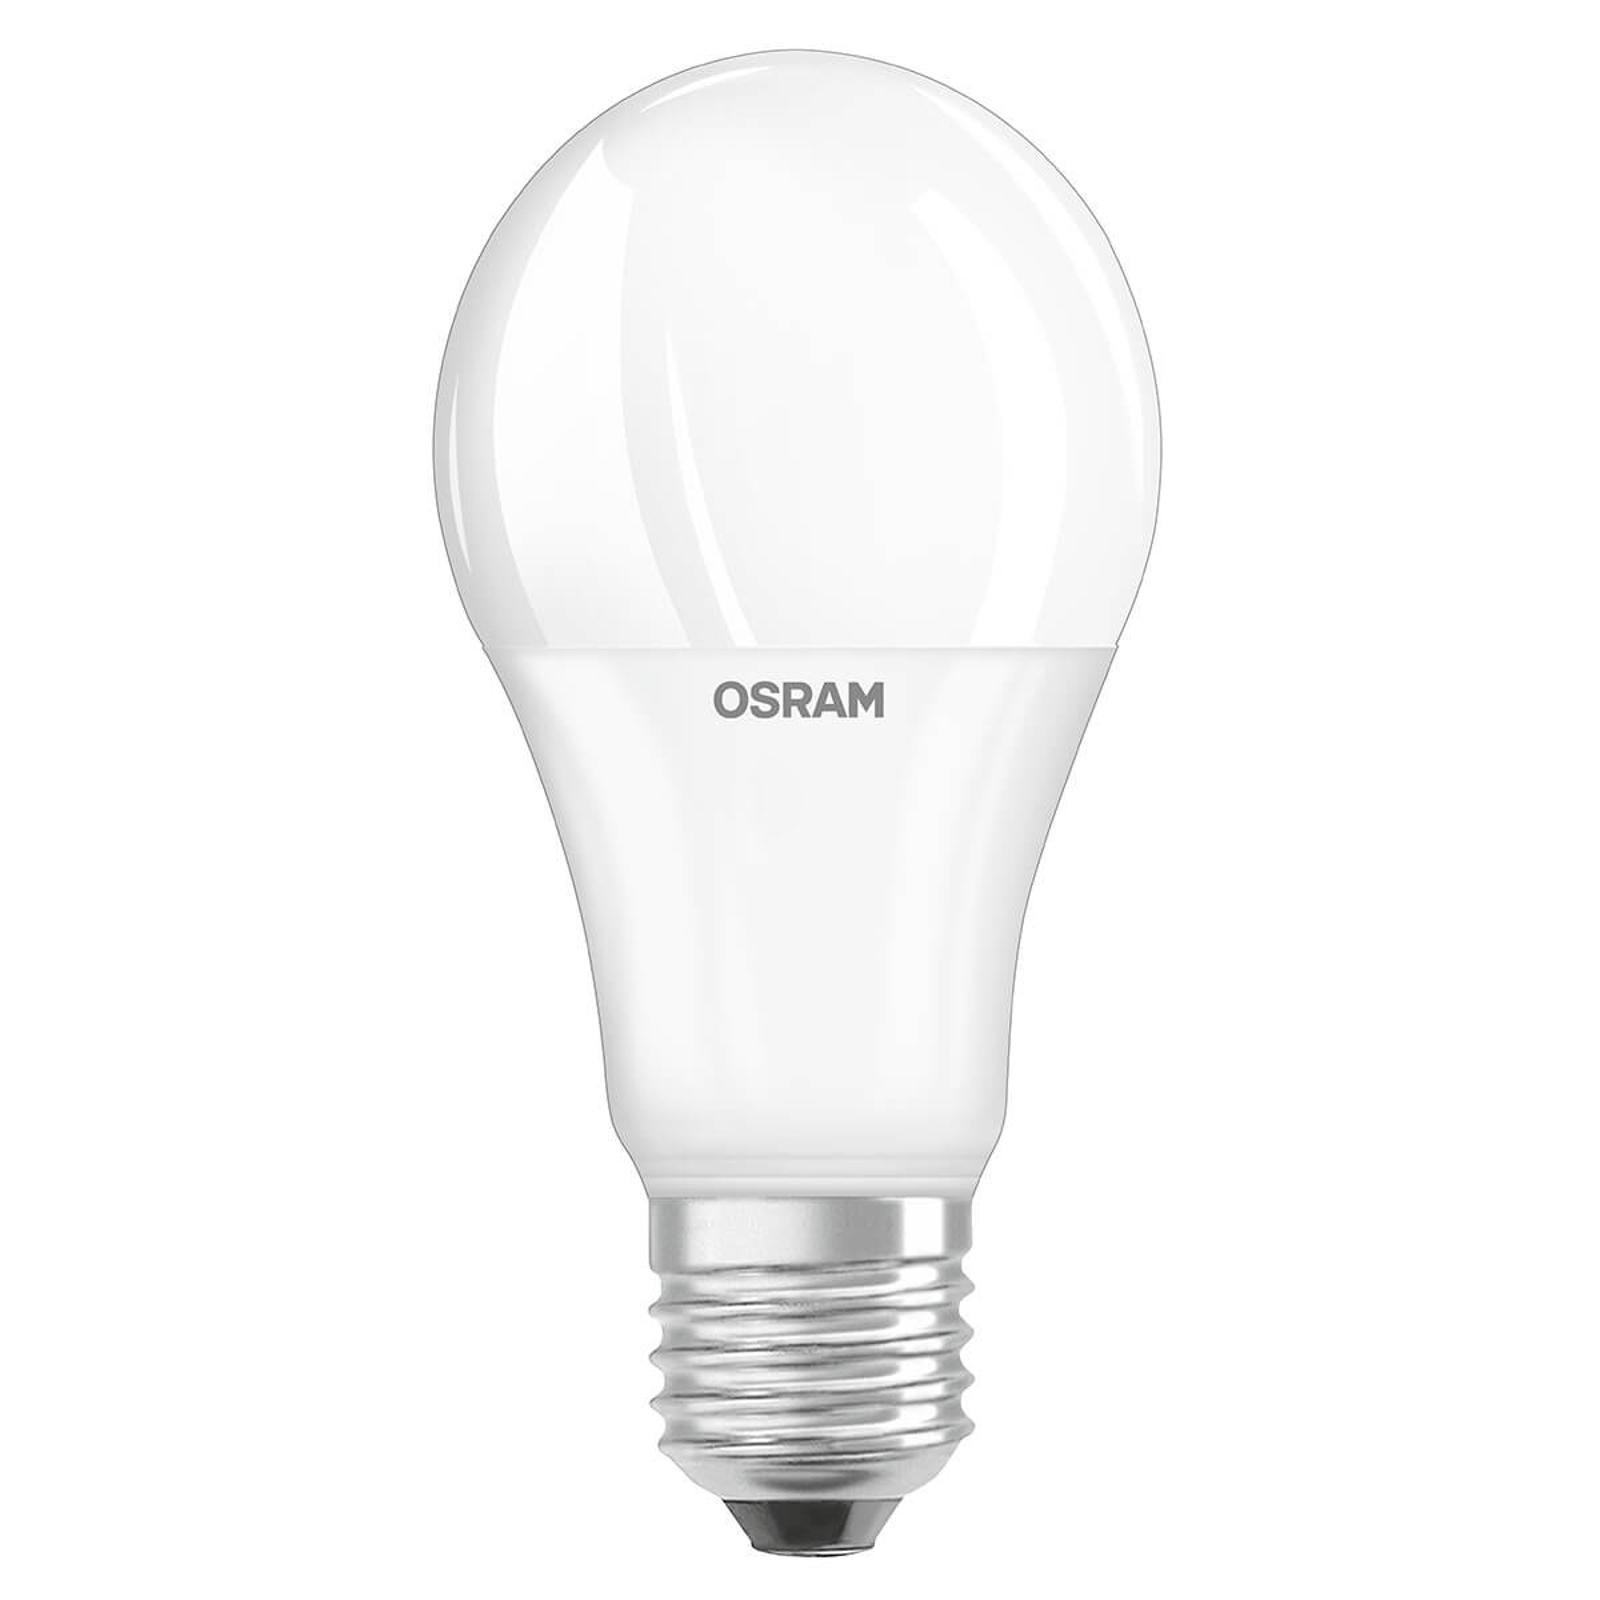 OSRAM-LED-lamppu E27 6W opaali päivänvaloanturi